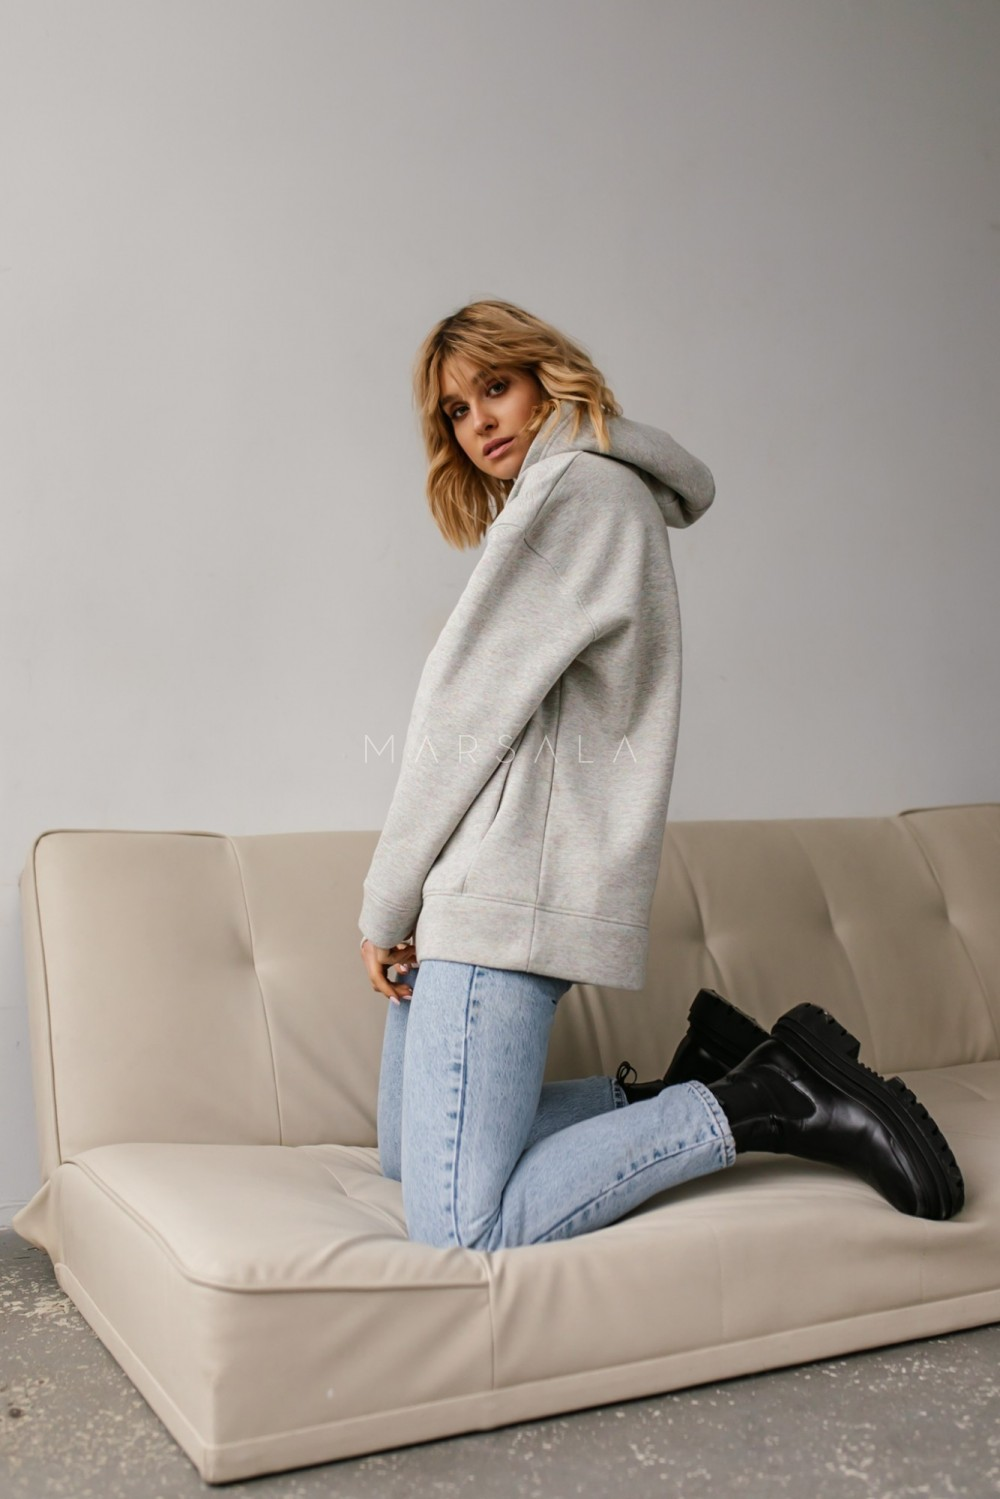 Bluza z kapturem w kolorze grey mellange multikolor - CARDIFF by Marsala